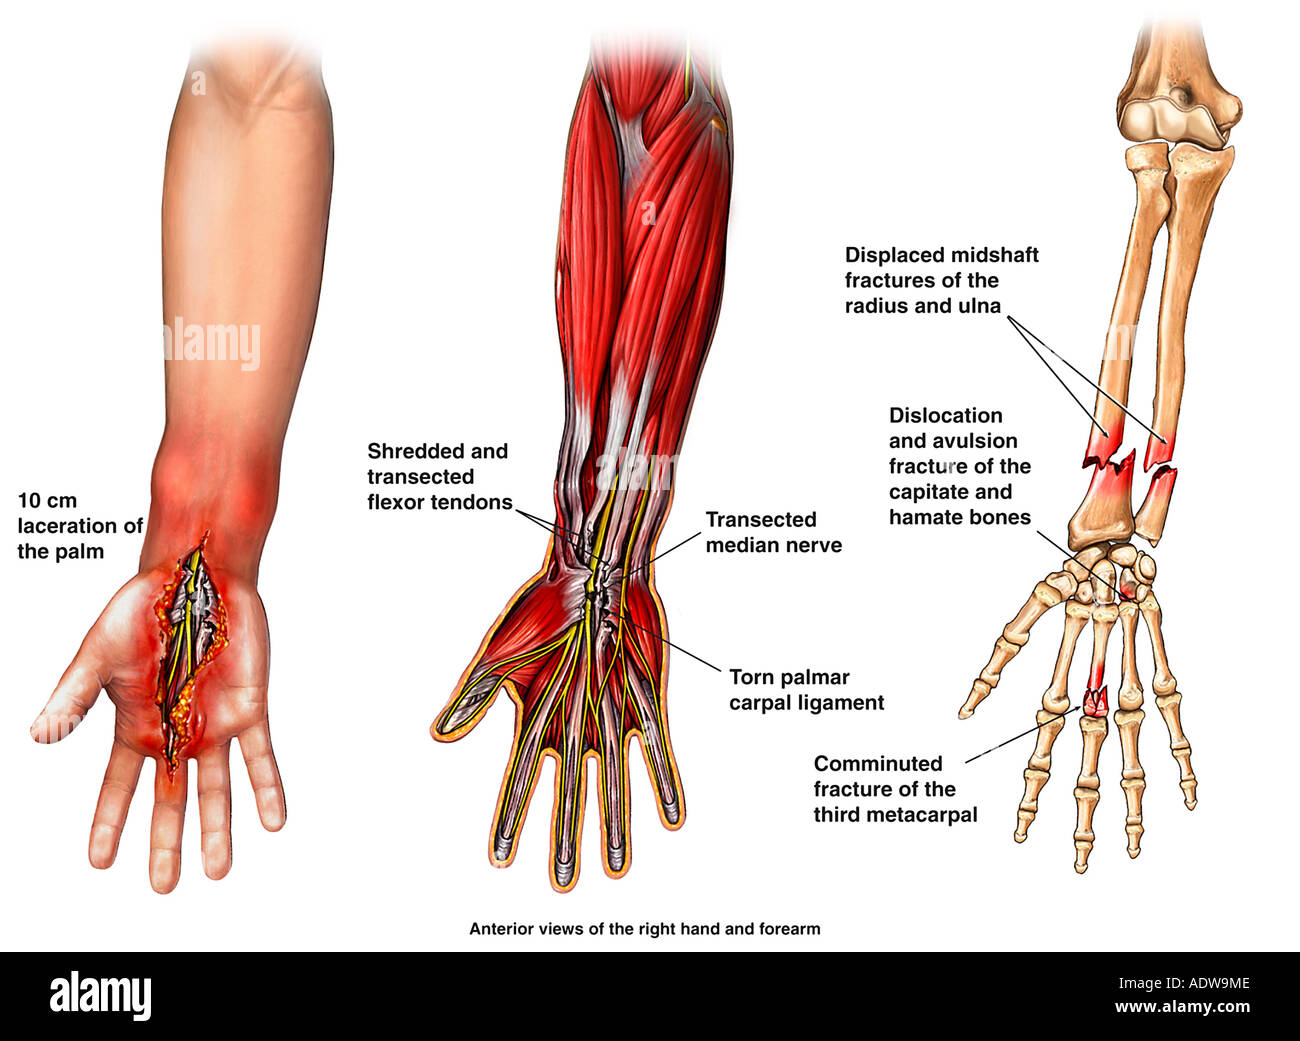 Dislocation Finger Stockfotos & Dislocation Finger Bilder - Alamy